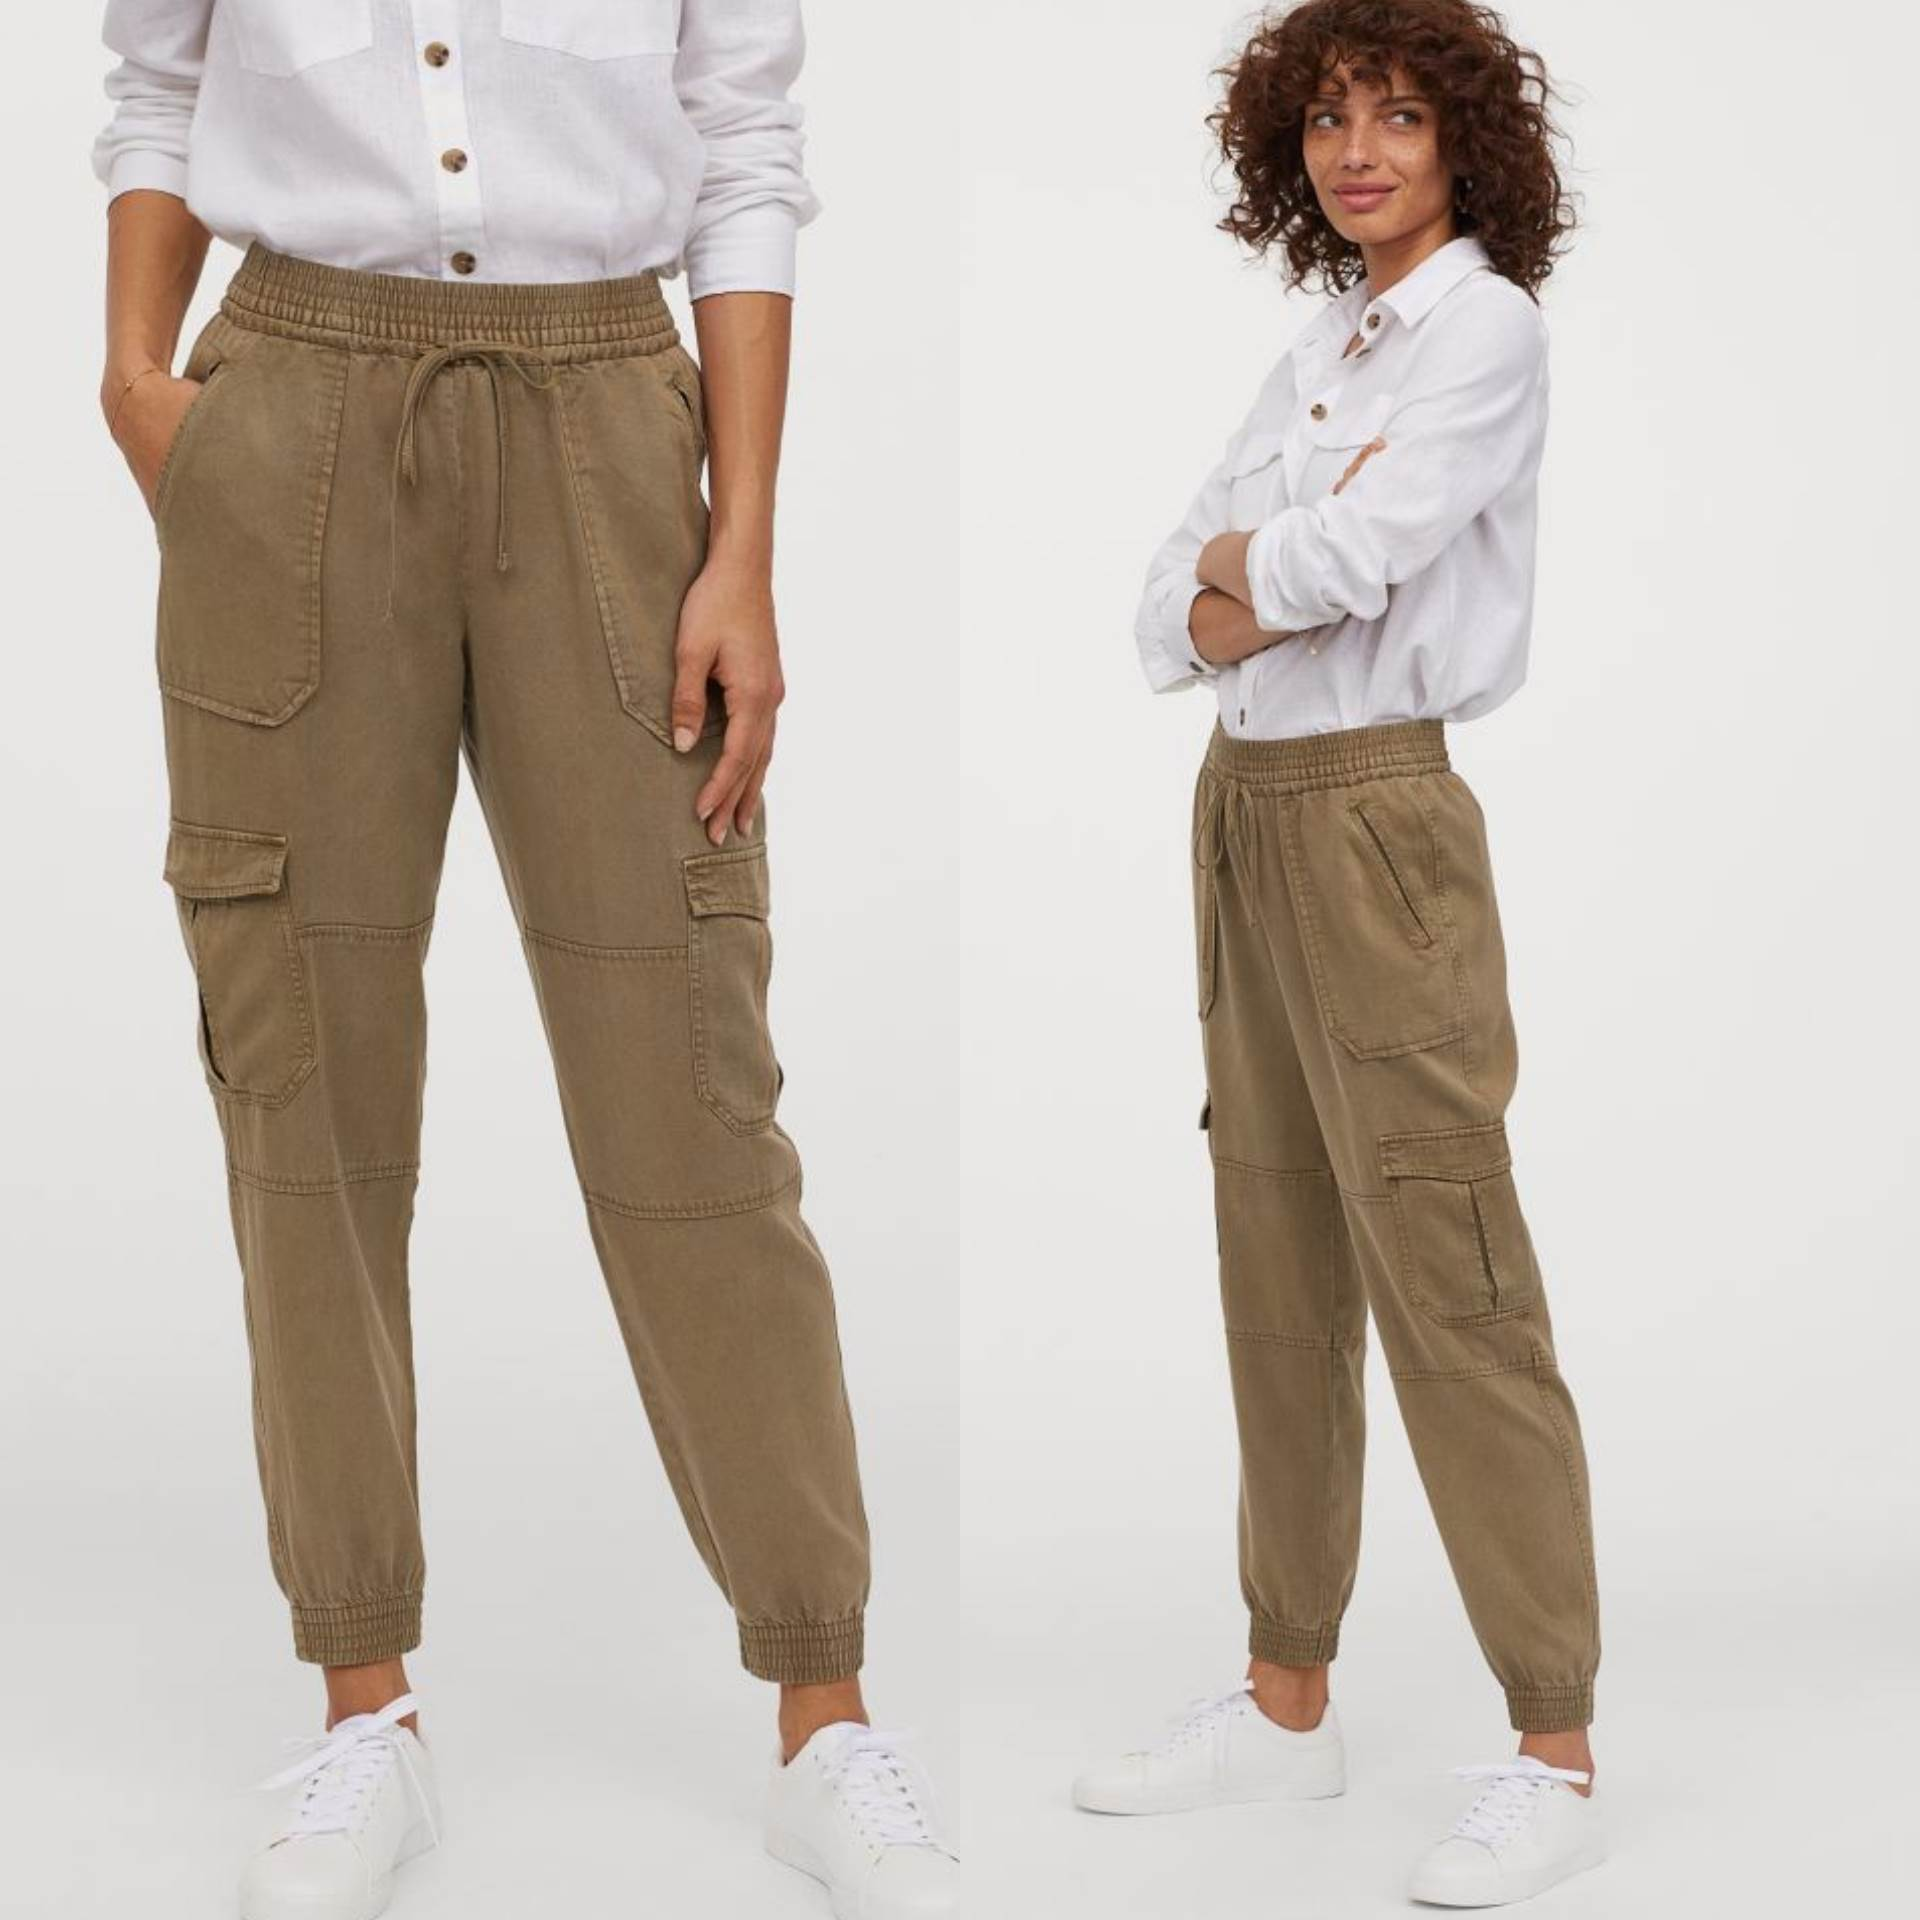 H&M hlače, 24,99$